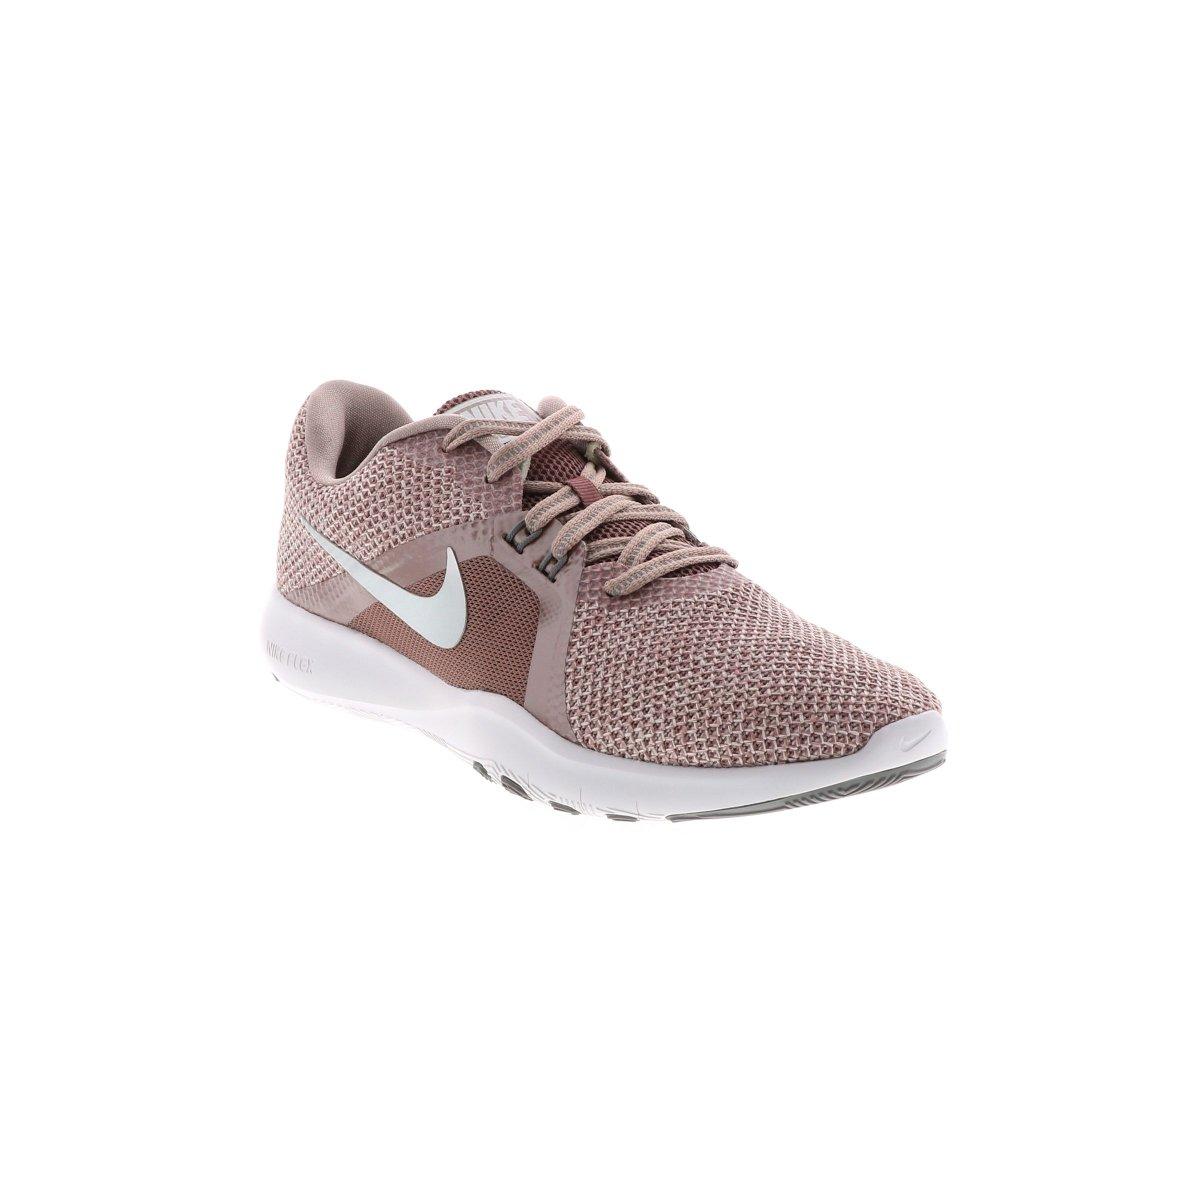 Tenis Feminino Nike Flex Trainer 8